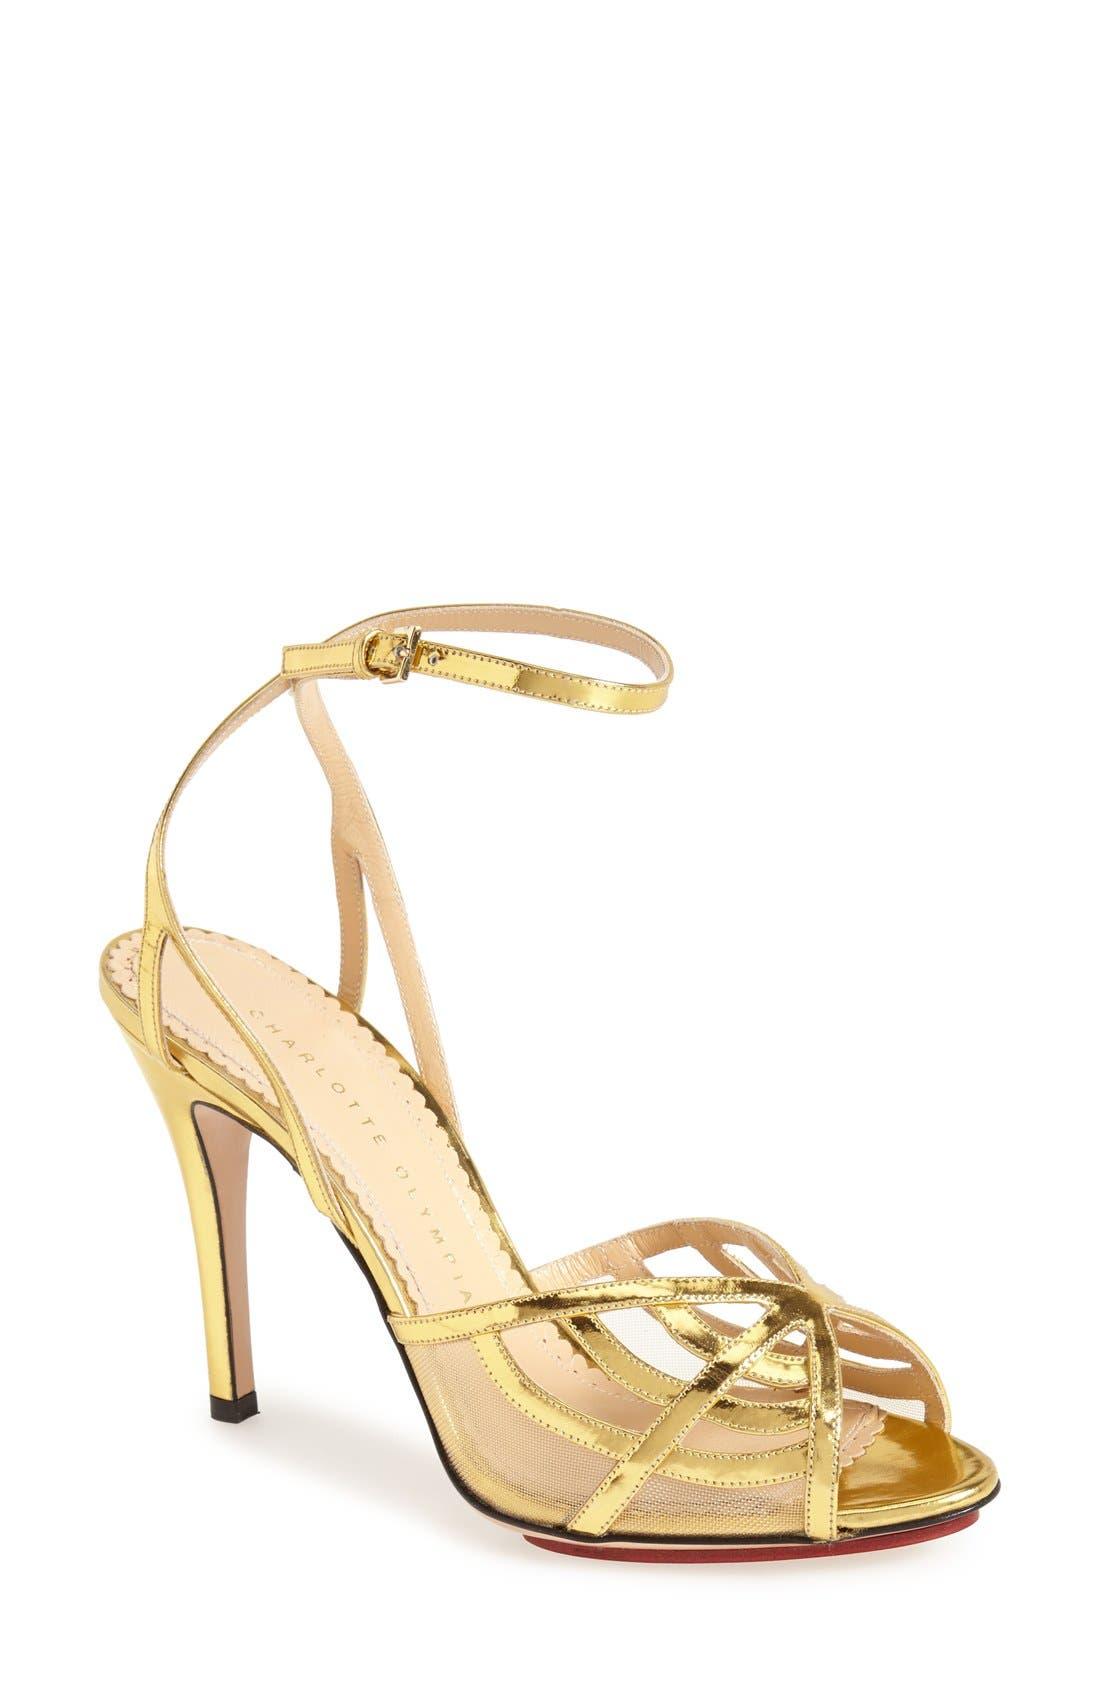 Alternate Image 1 Selected - Charlotte Olympia 'Octavia' Platform Sandal (Women)